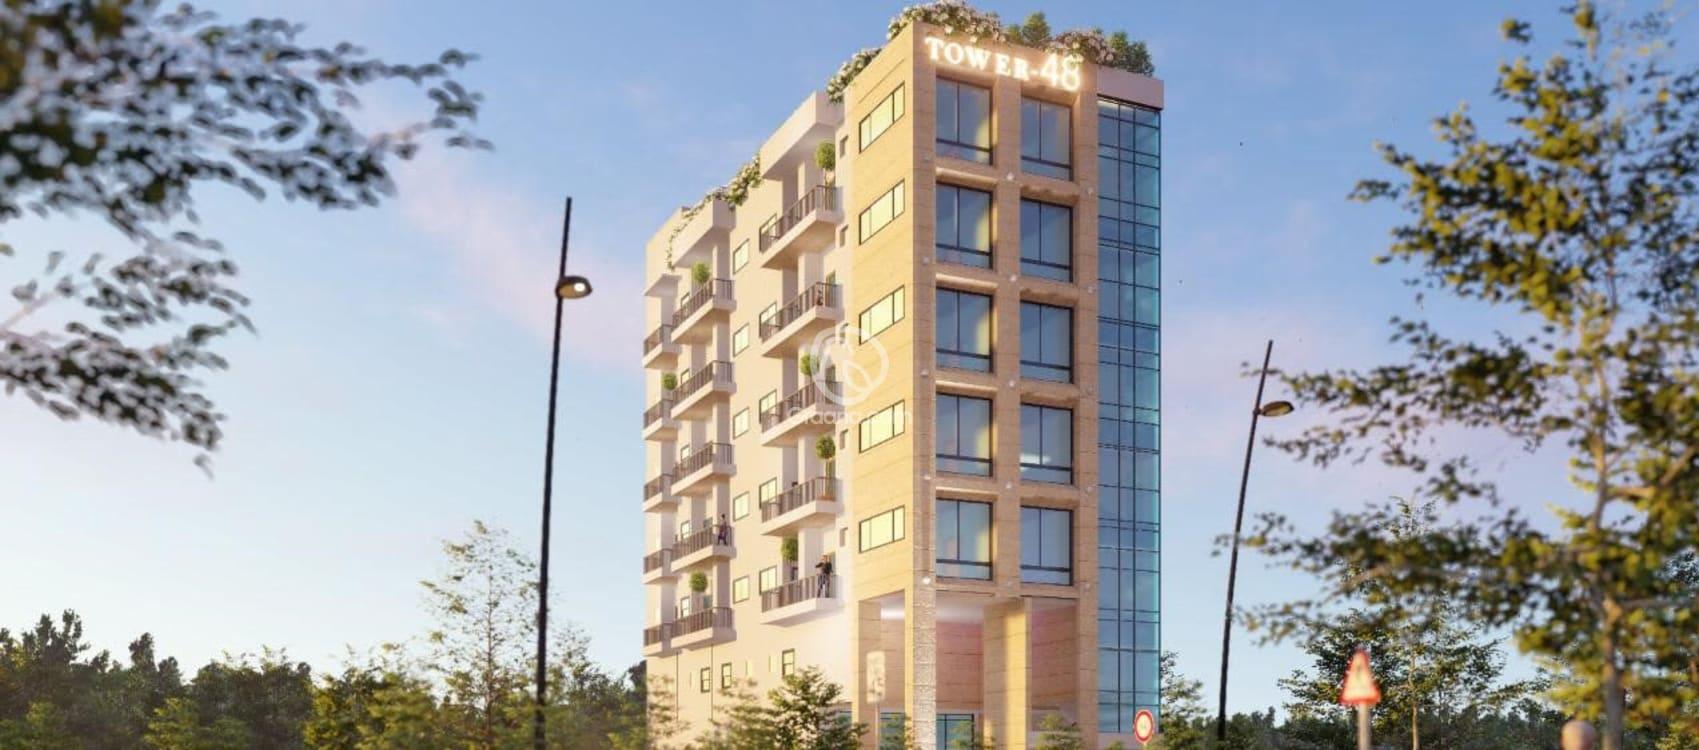 585 SqFt Apartment For Sale   Graana.com